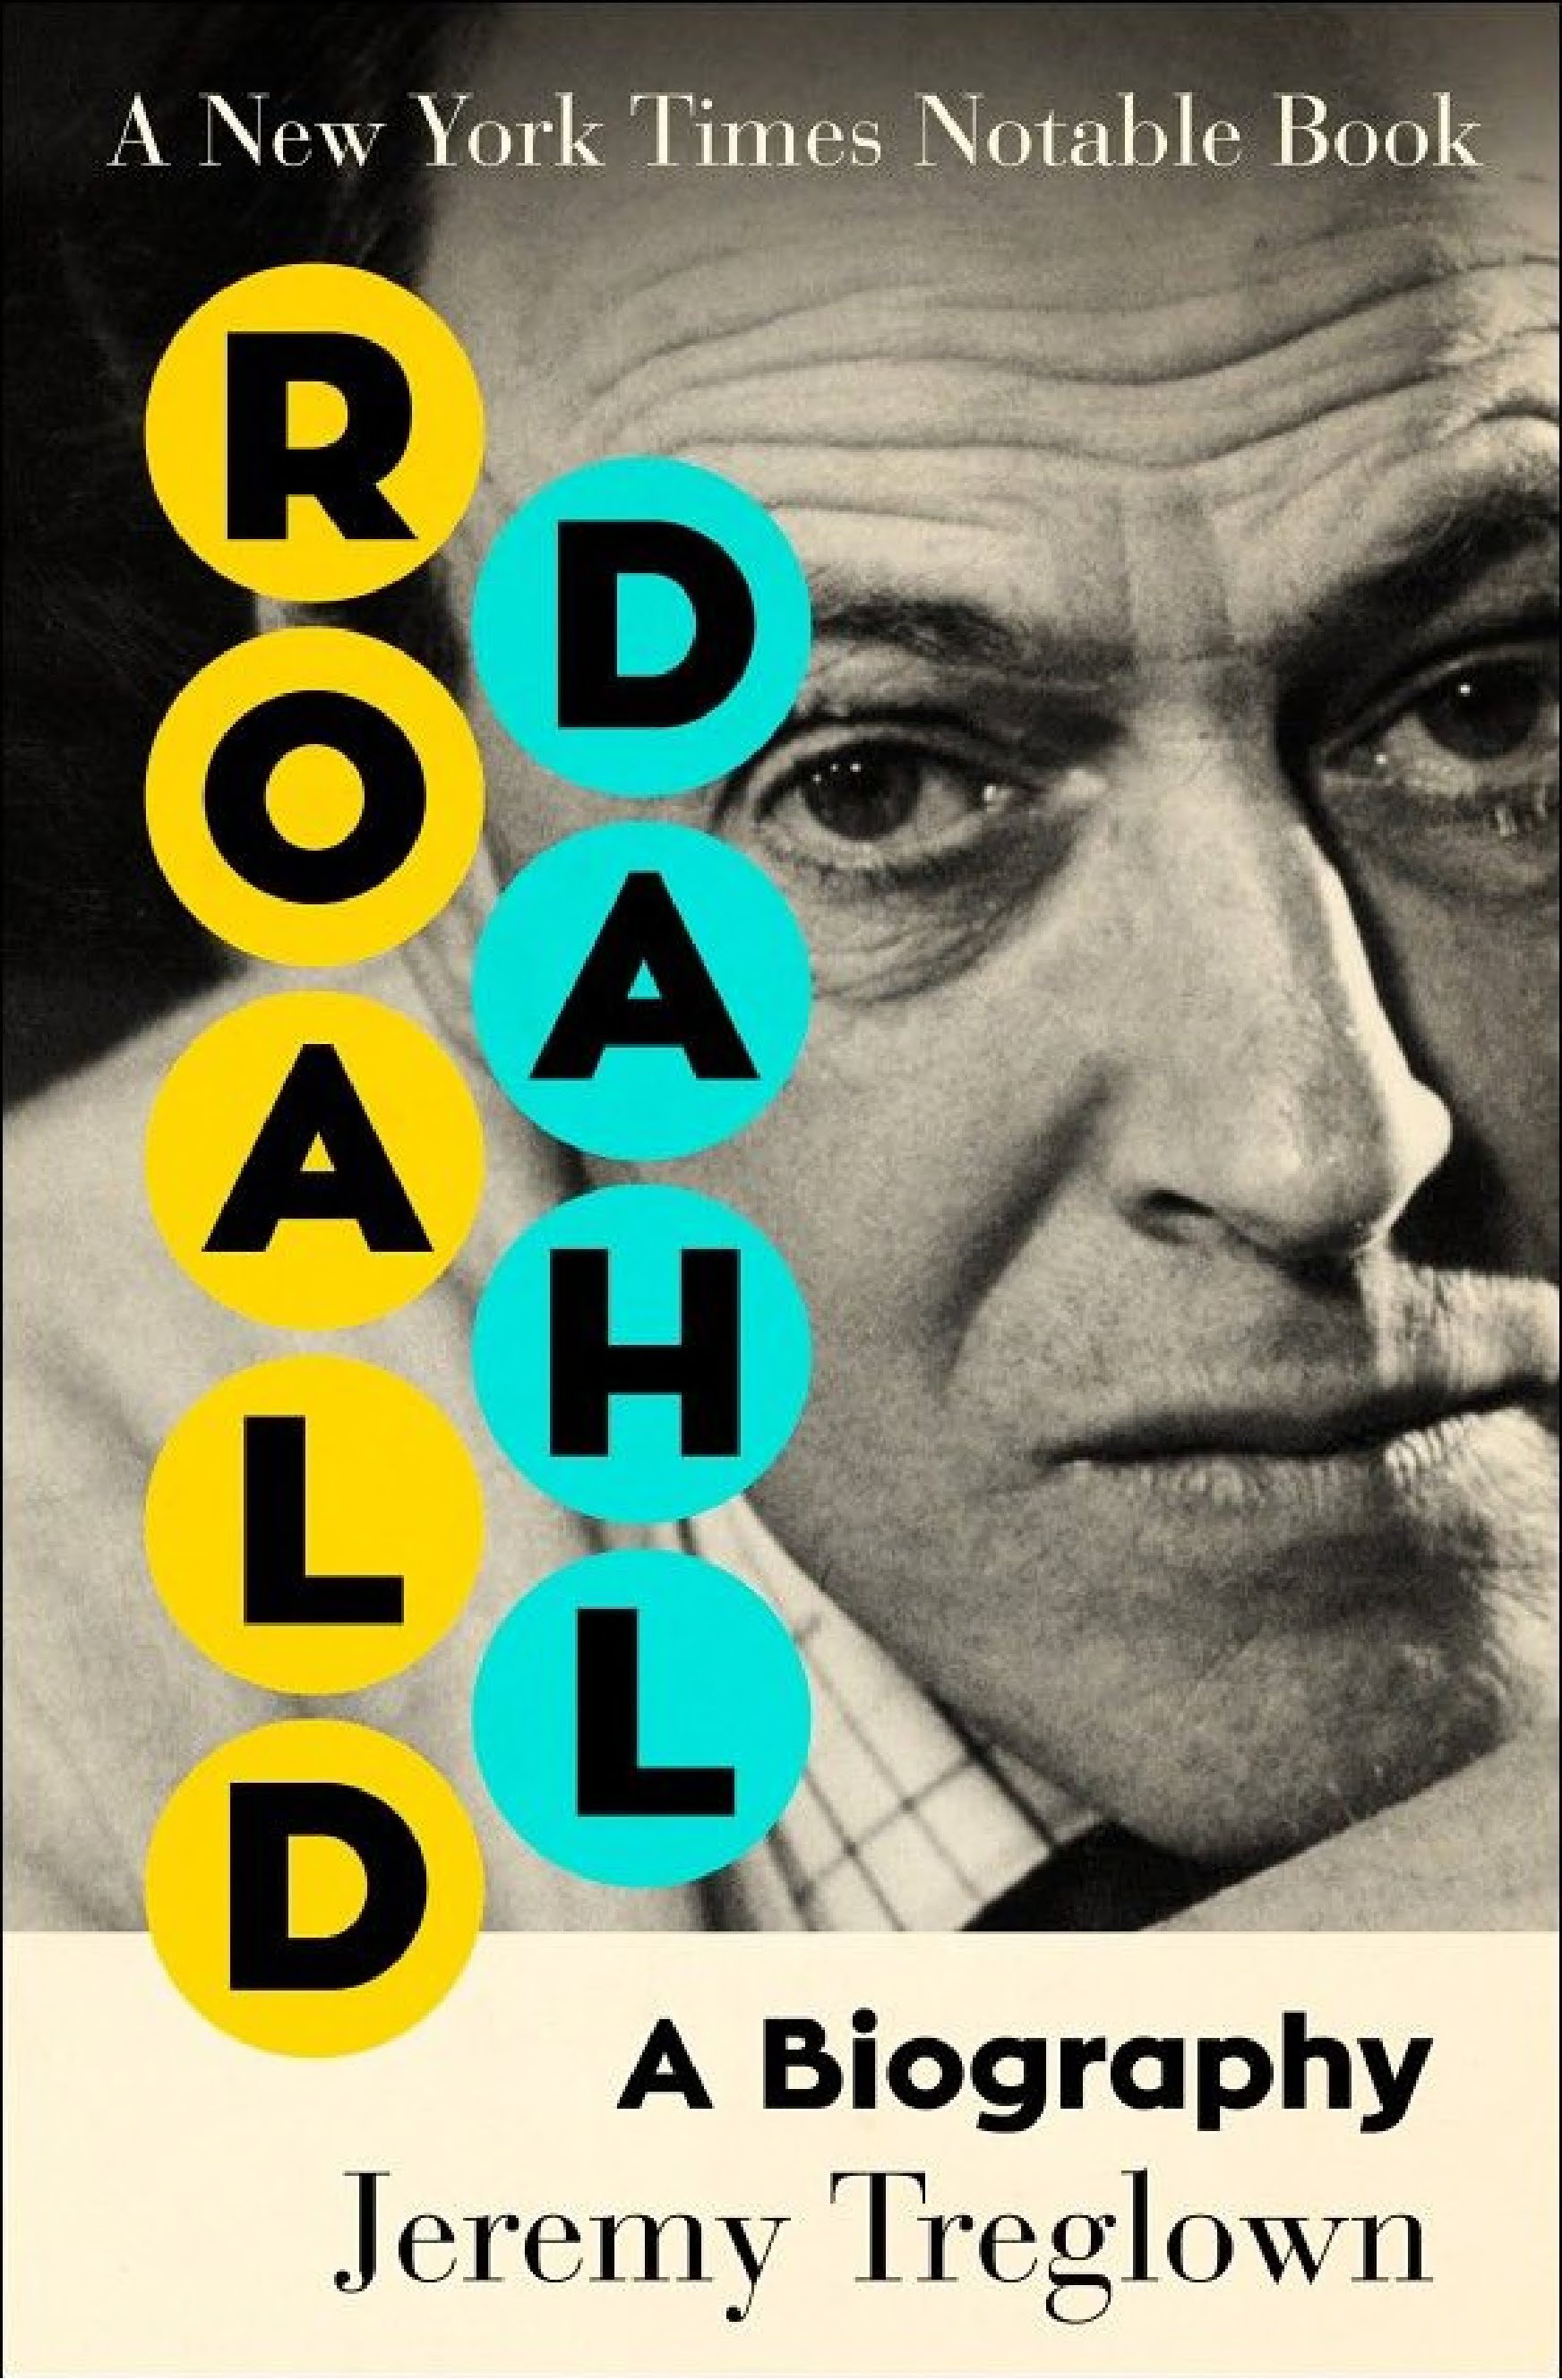 Roald Dahl A Biography - Roald Dahl: A Biography